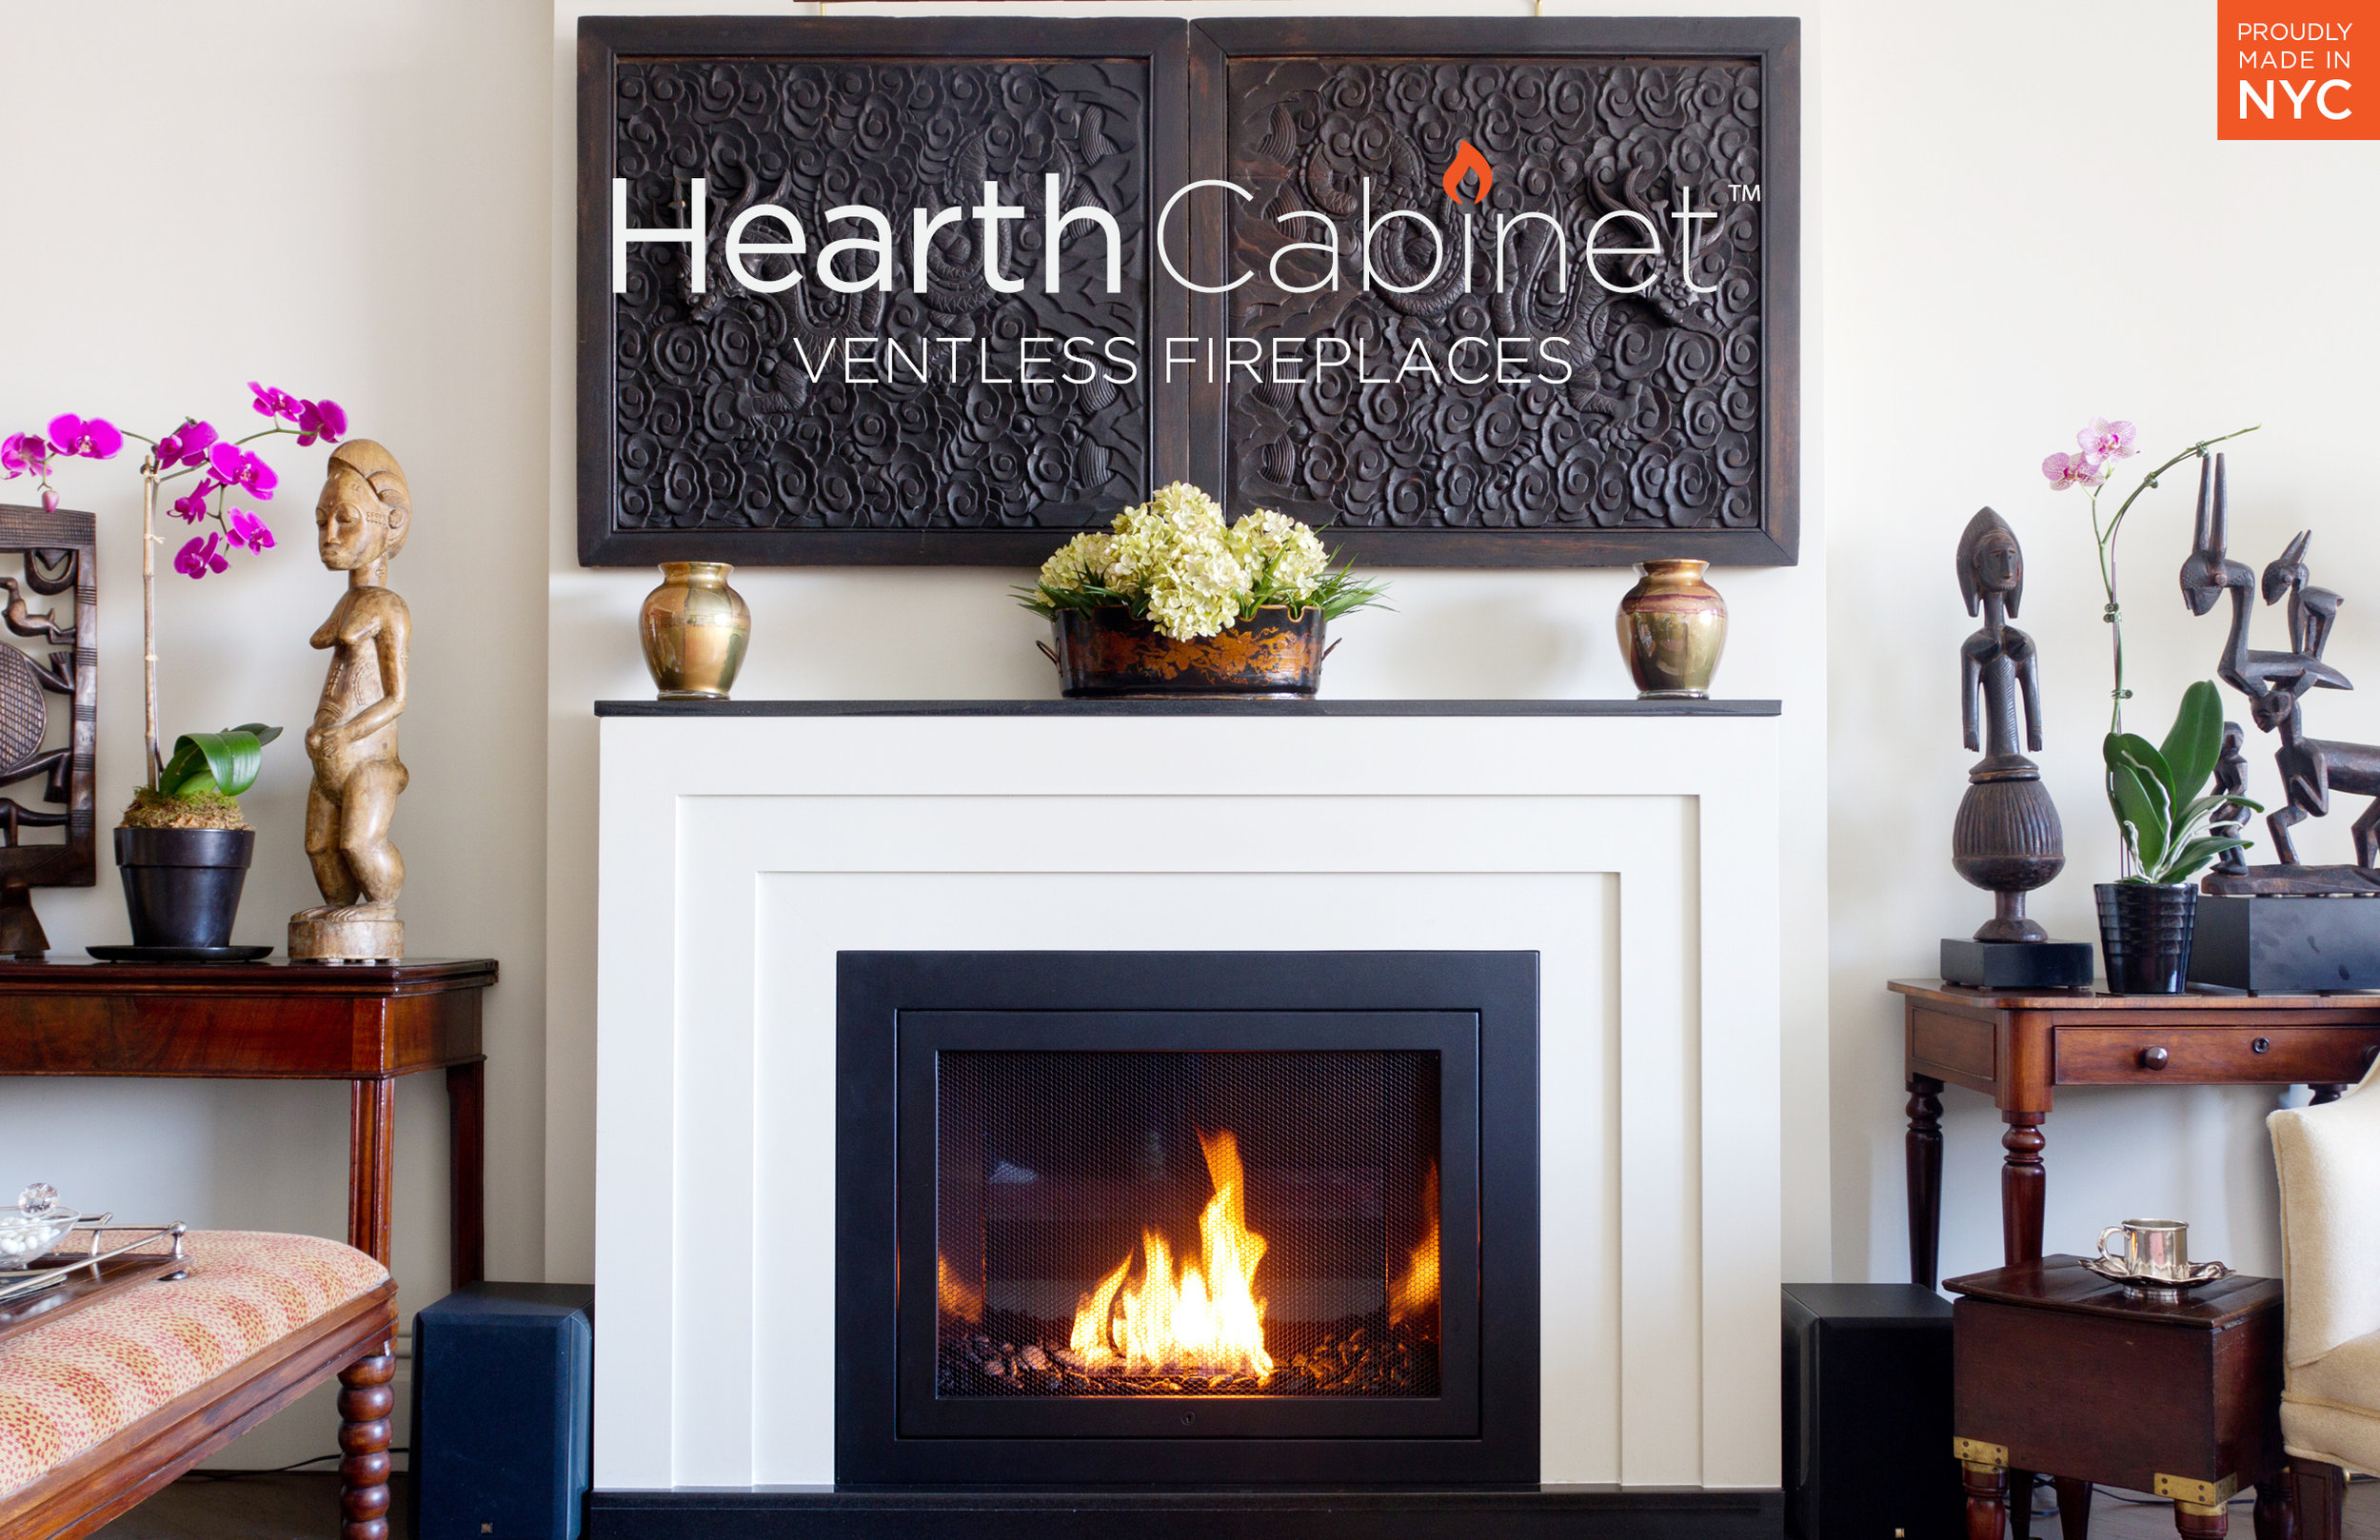 HearthCabinet Ventless Fireplaces 2017 Brochure (DIGITAL) 12.22 - Cover.jpg